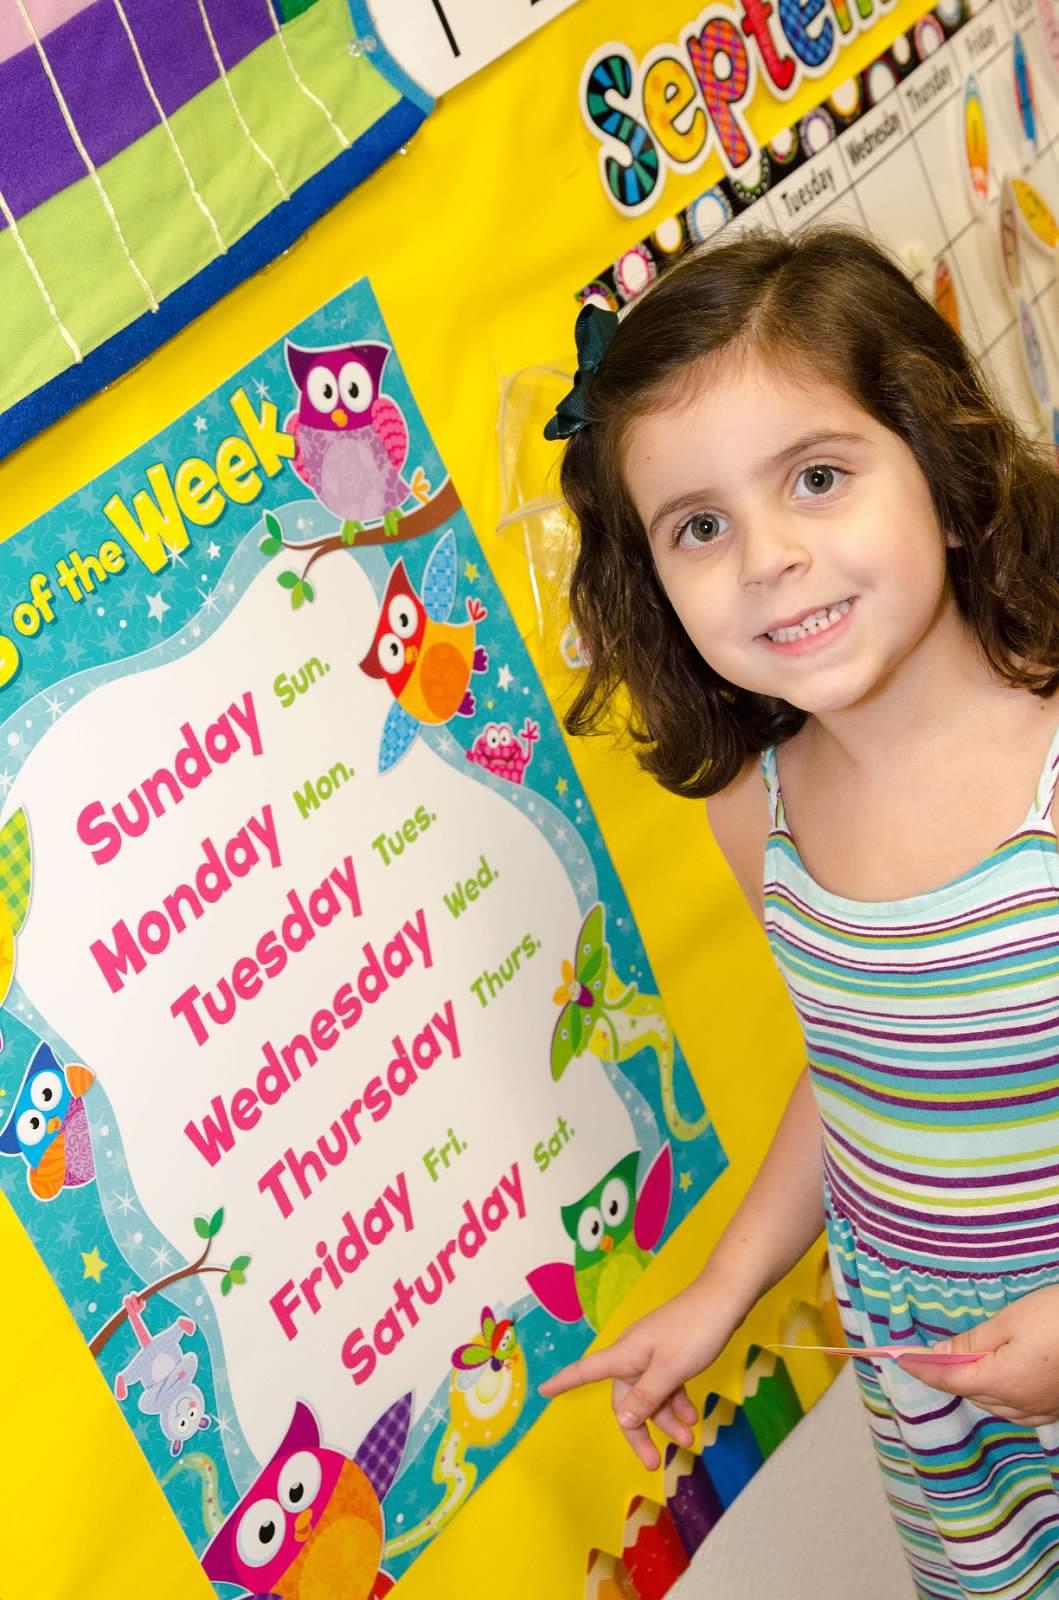 4 year old curriculum at Scottsdale Preschool